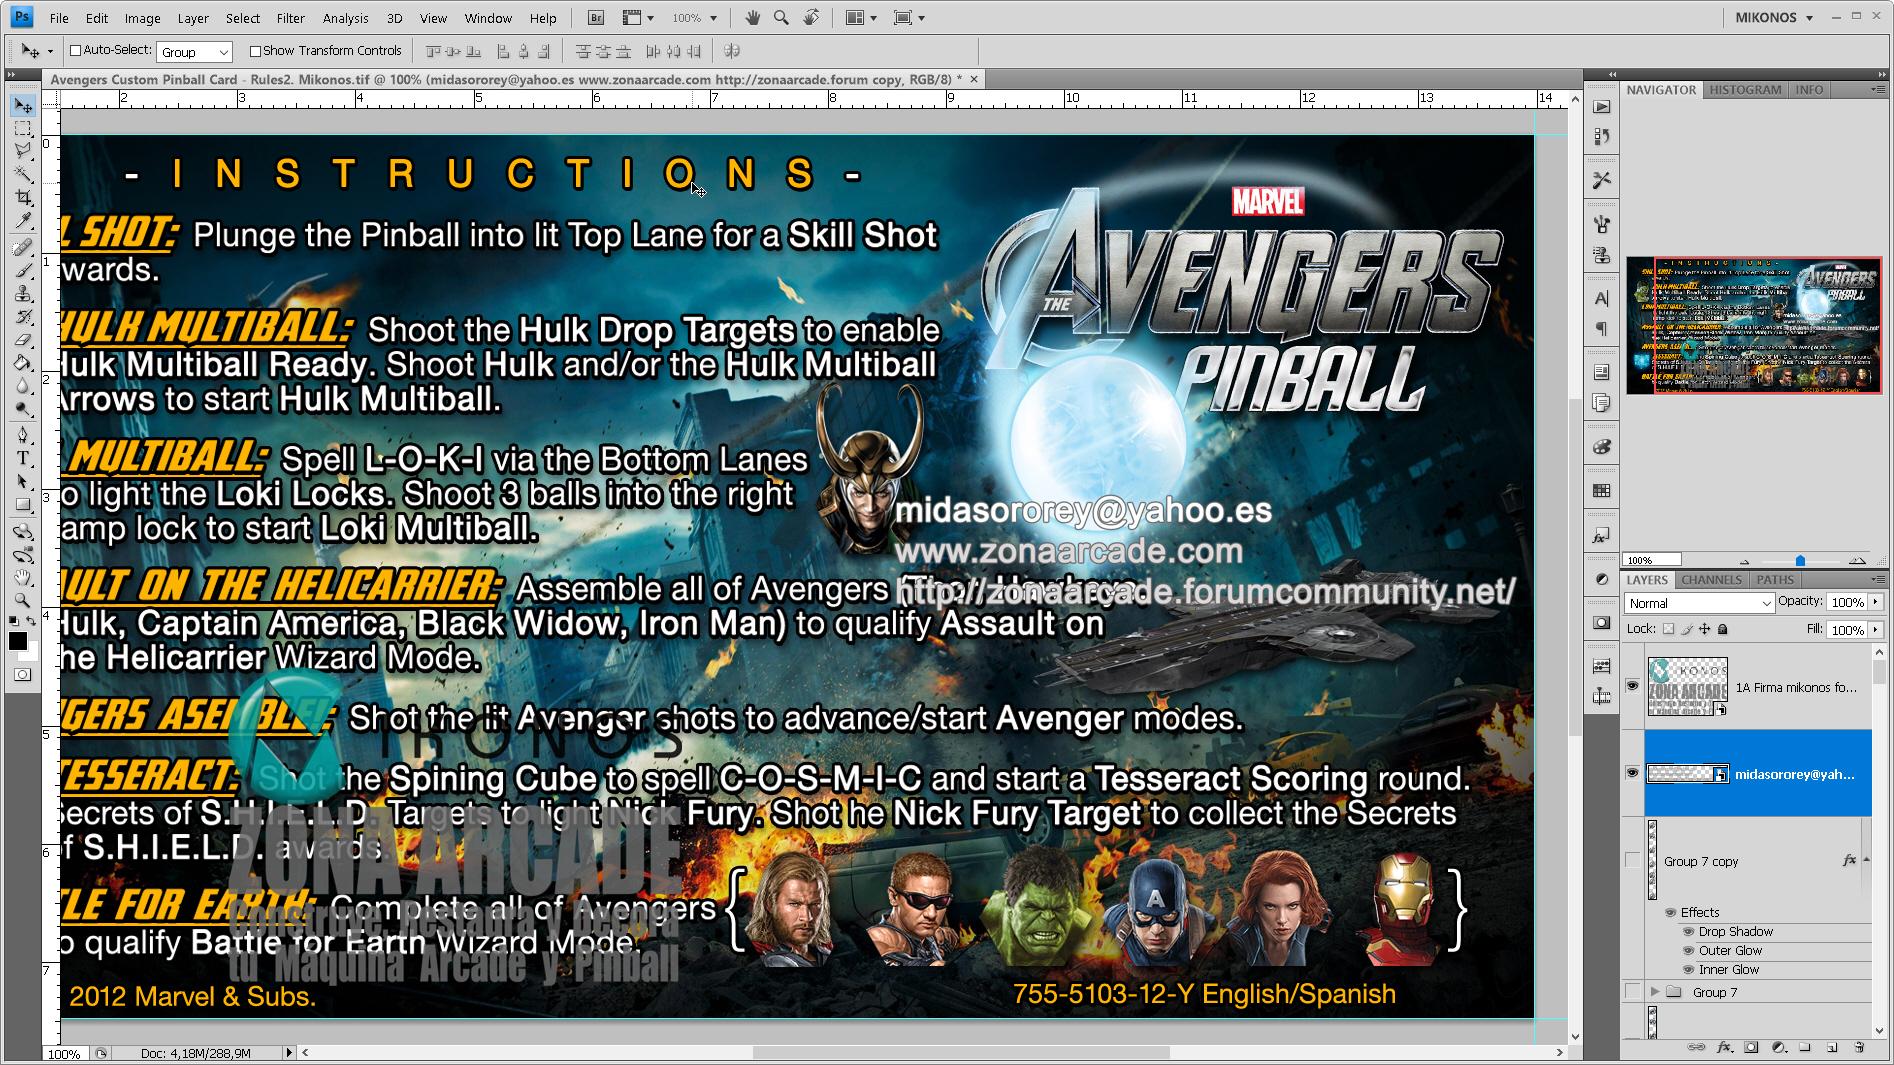 The Avengers Custom Pinball Card - Rules.%20Mikonos2